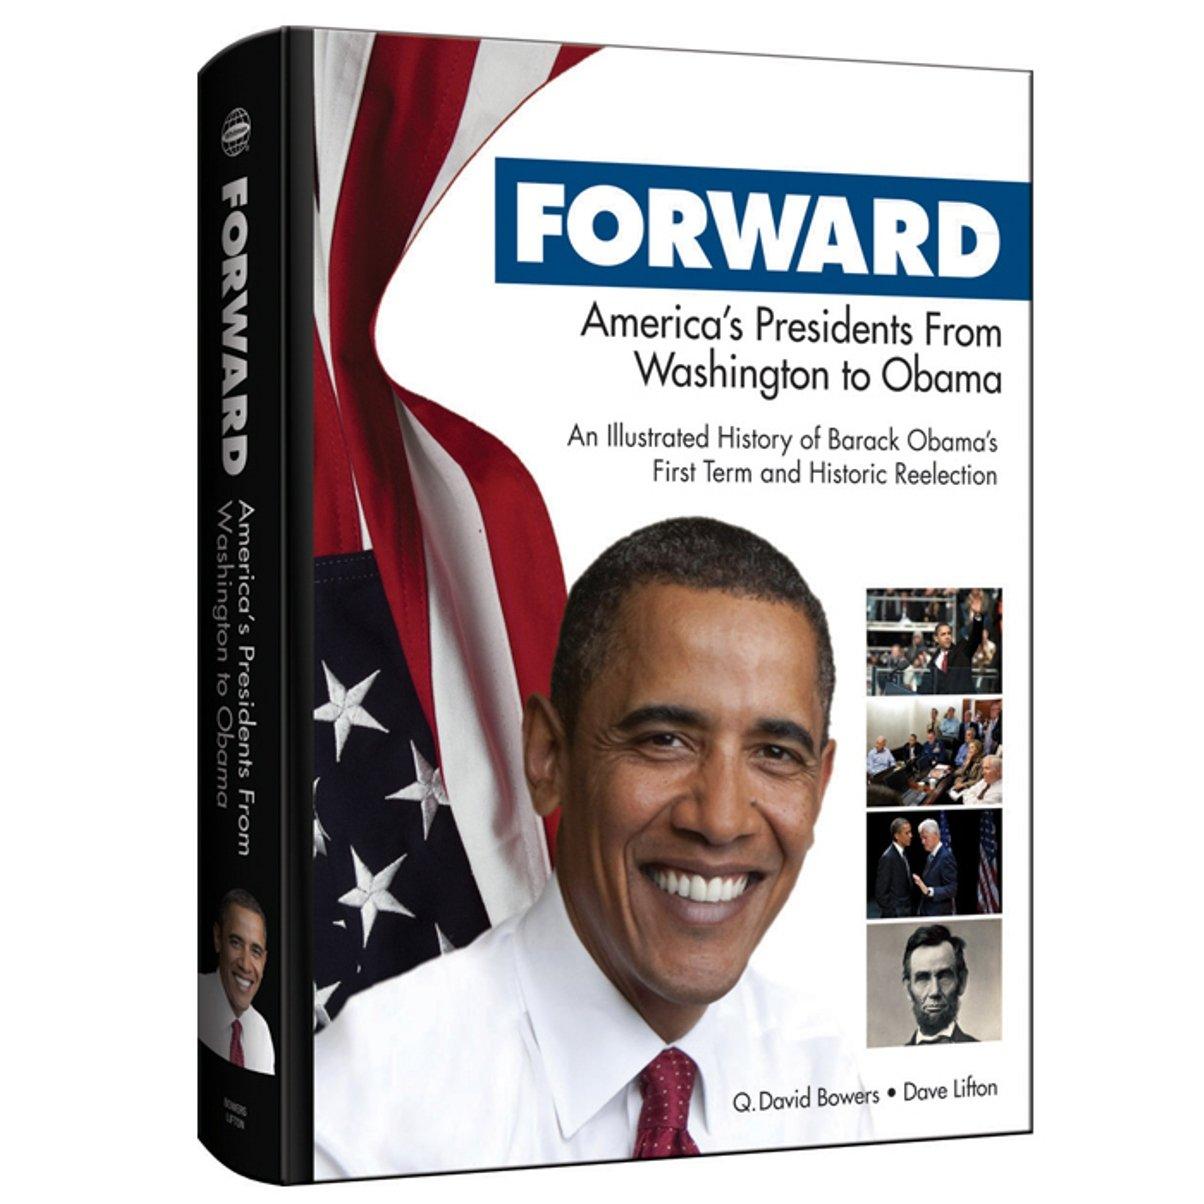 Forward: America's Presidents from Washington to Obama